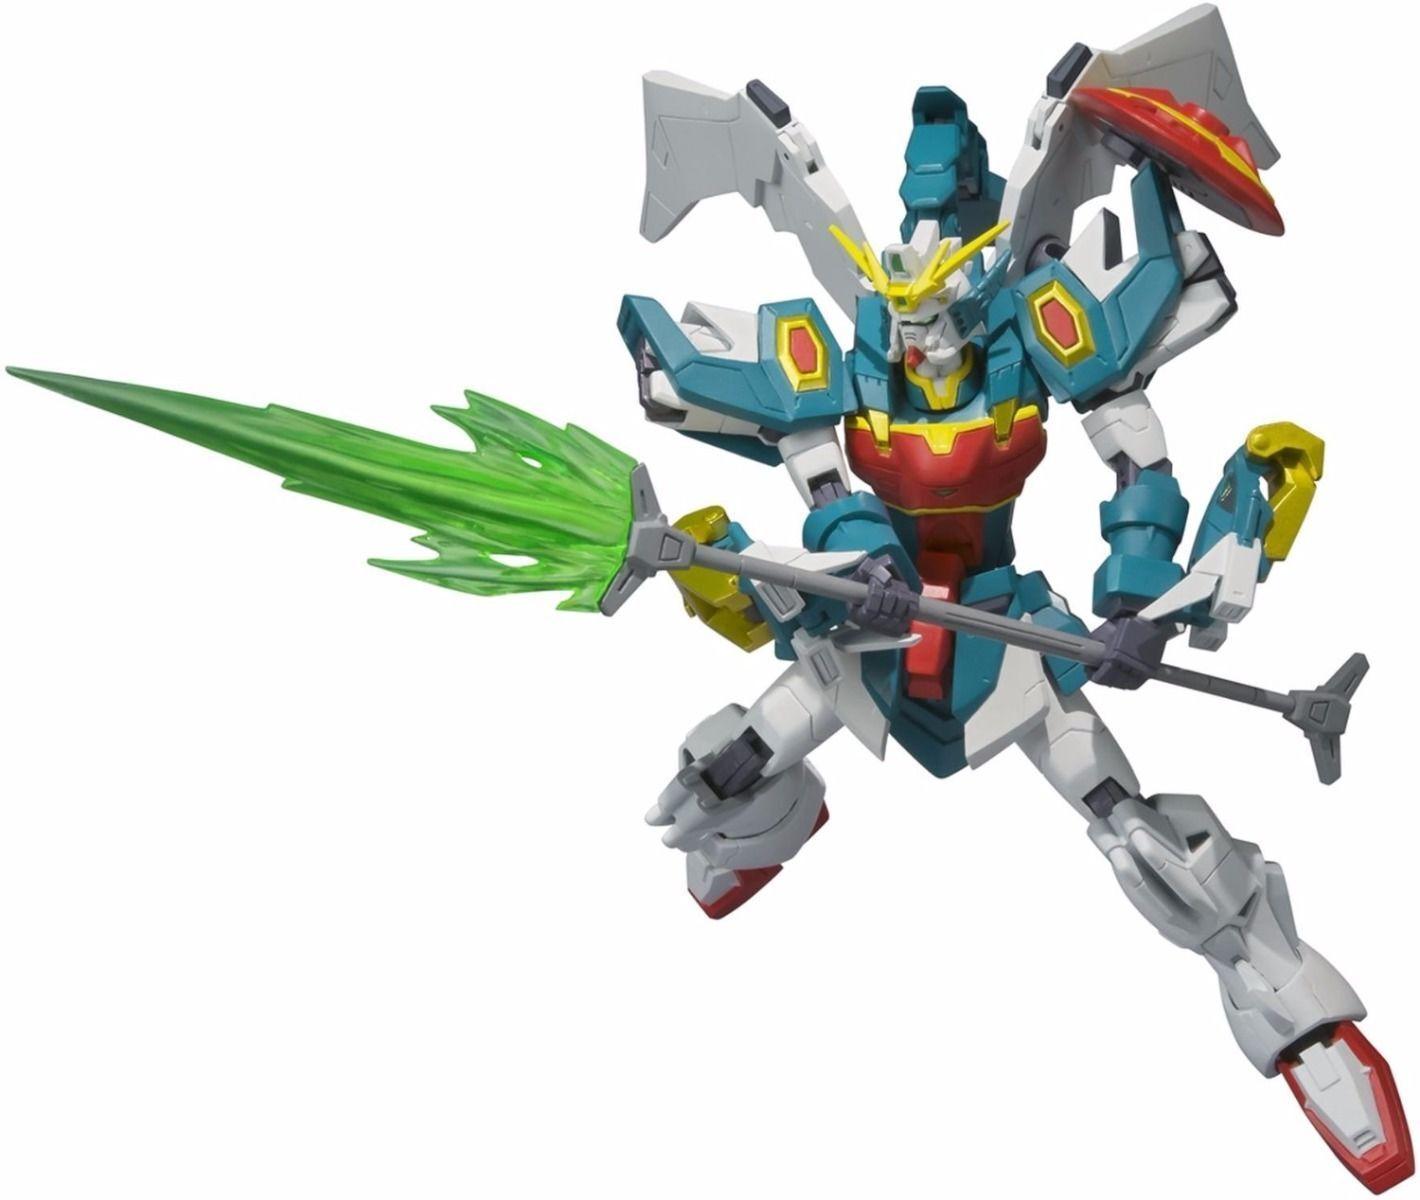 ROBOT SPIRITS  Side MS ALTRON GUNDAM azione cifra BeAI TAMASHII NATIONS Japan  prendi l'ultimo